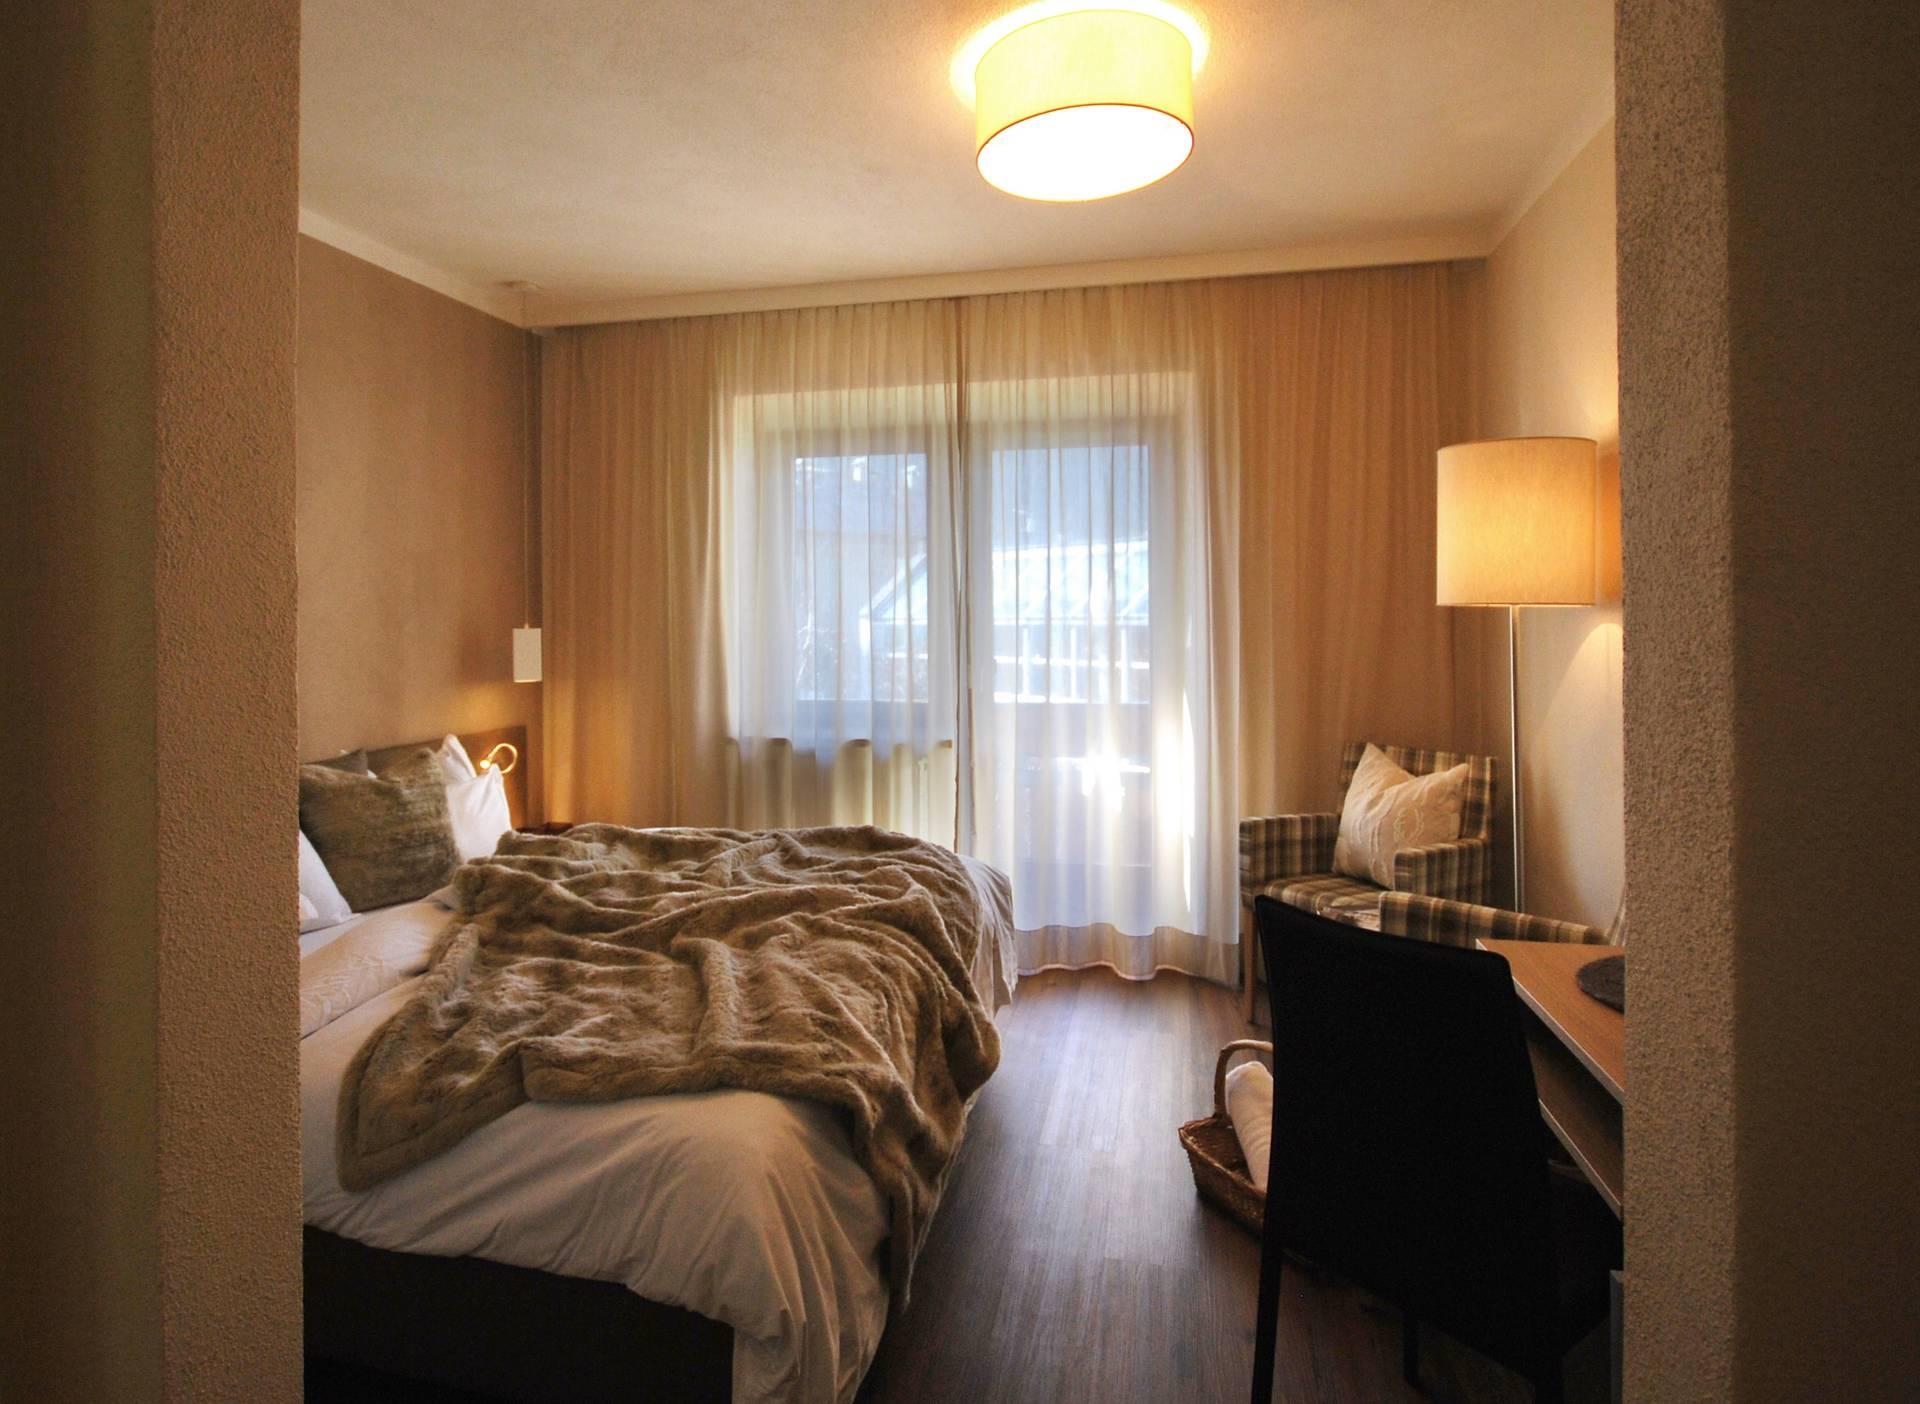 hotel m hlener hof selectiv ihr m bel und einrichtungshaus in bruneck s dtirol. Black Bedroom Furniture Sets. Home Design Ideas